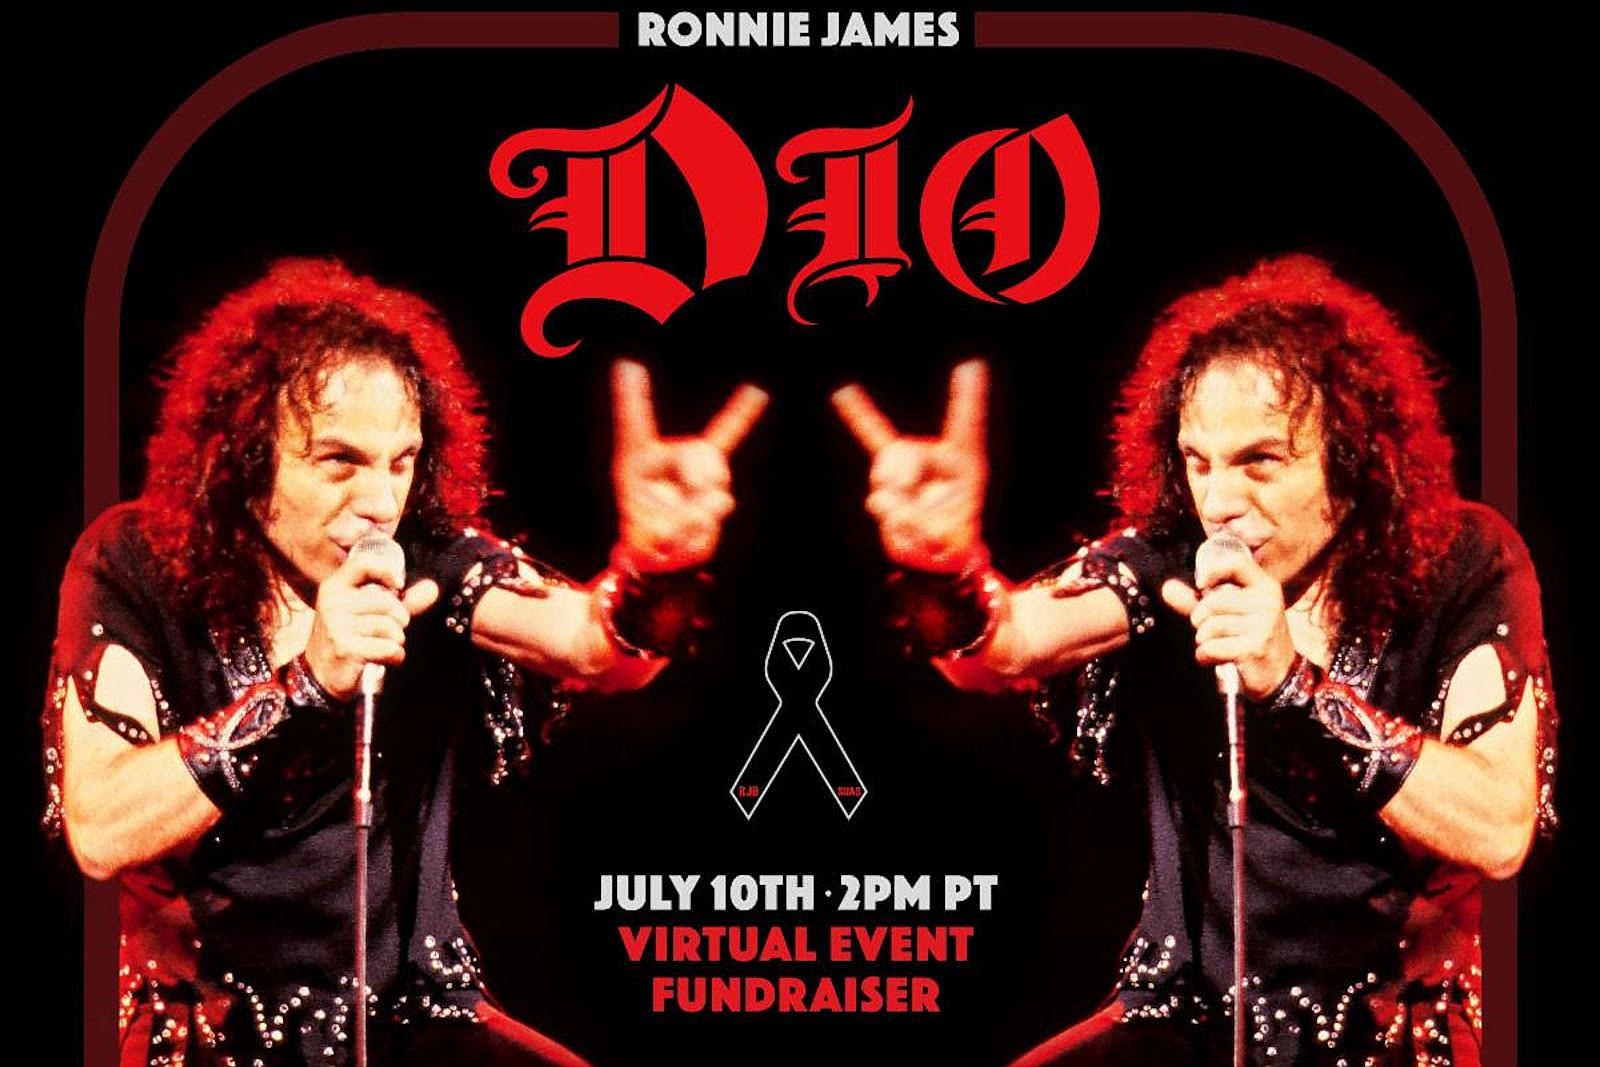 Rob Halford, Sammy Hagar Join Virtual Tribute to Ronnie James Dio